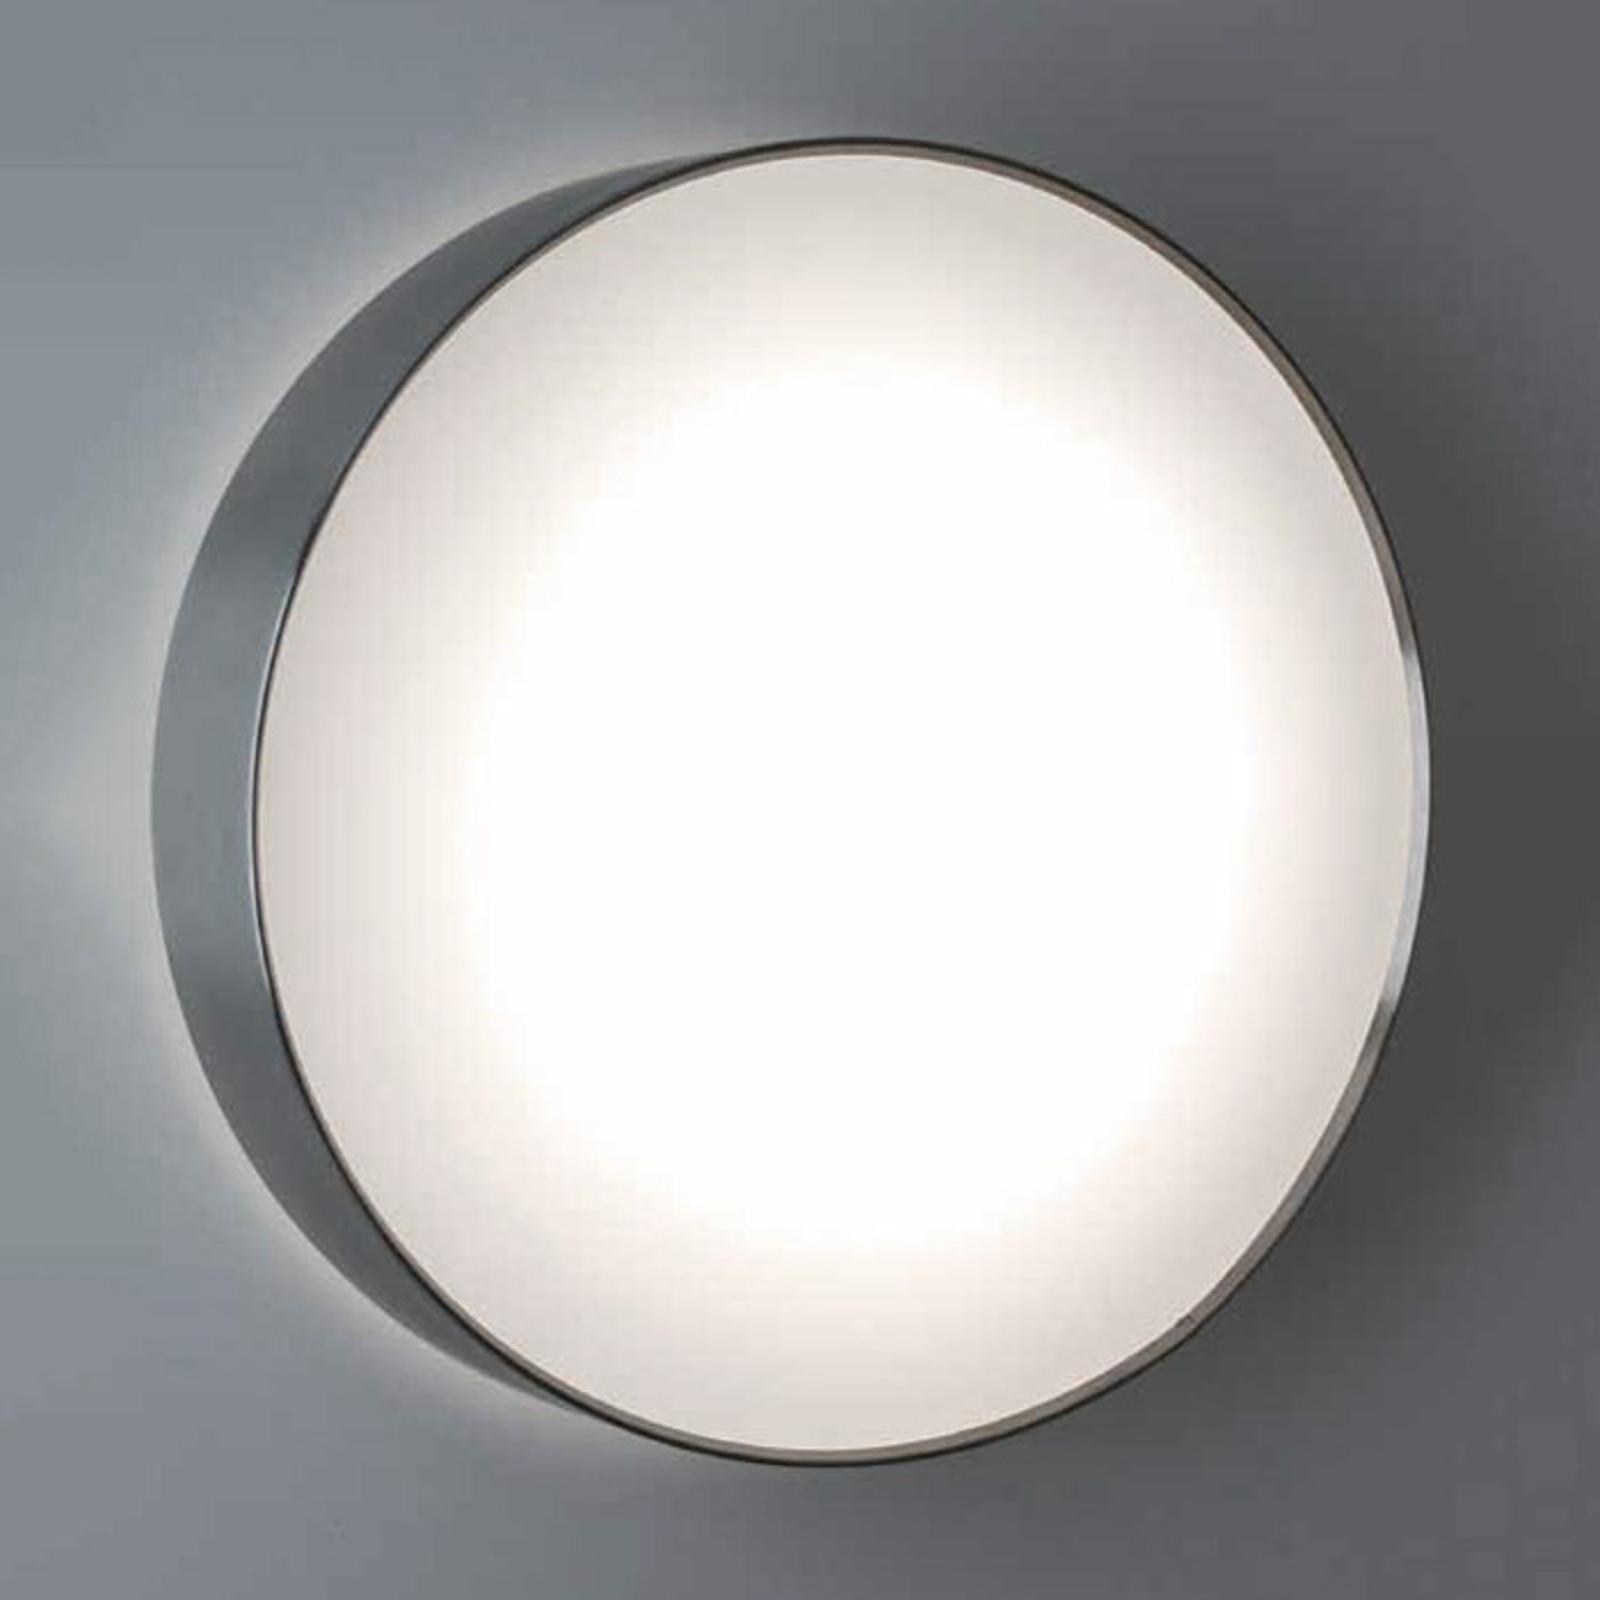 Lampa sufitowa SUN 4 LED stal szlachetna 13W 4K